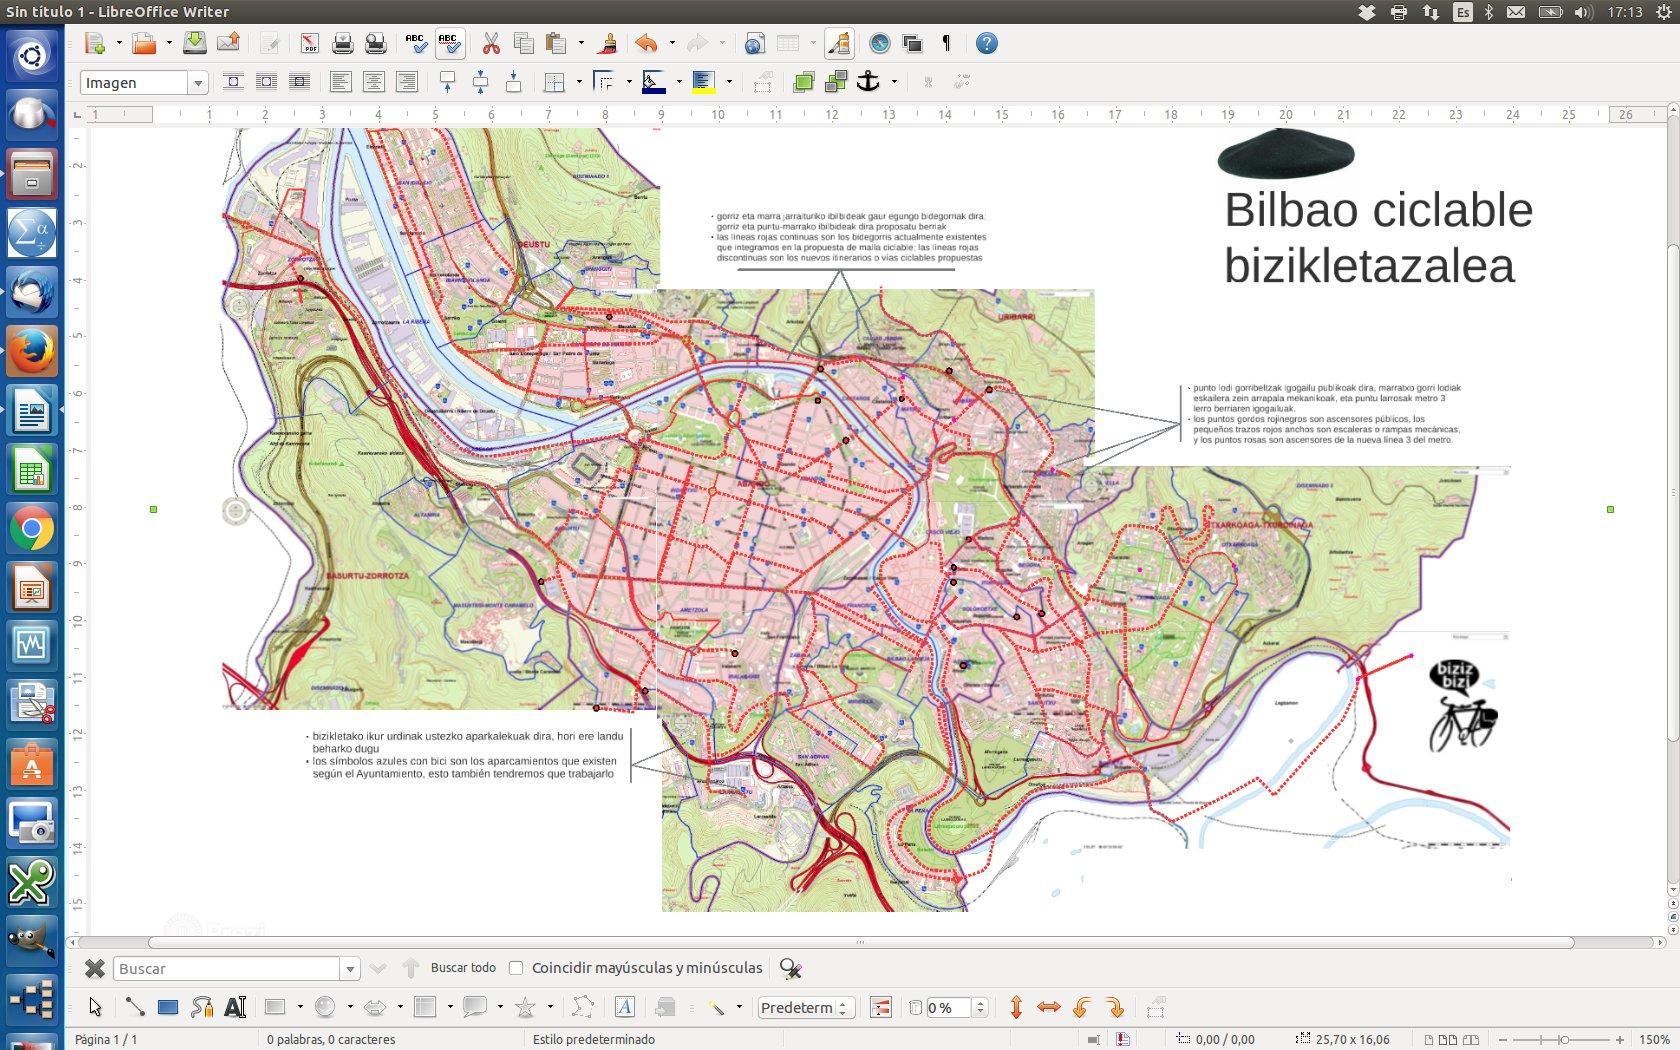 La malla de Bilbao Ciclable